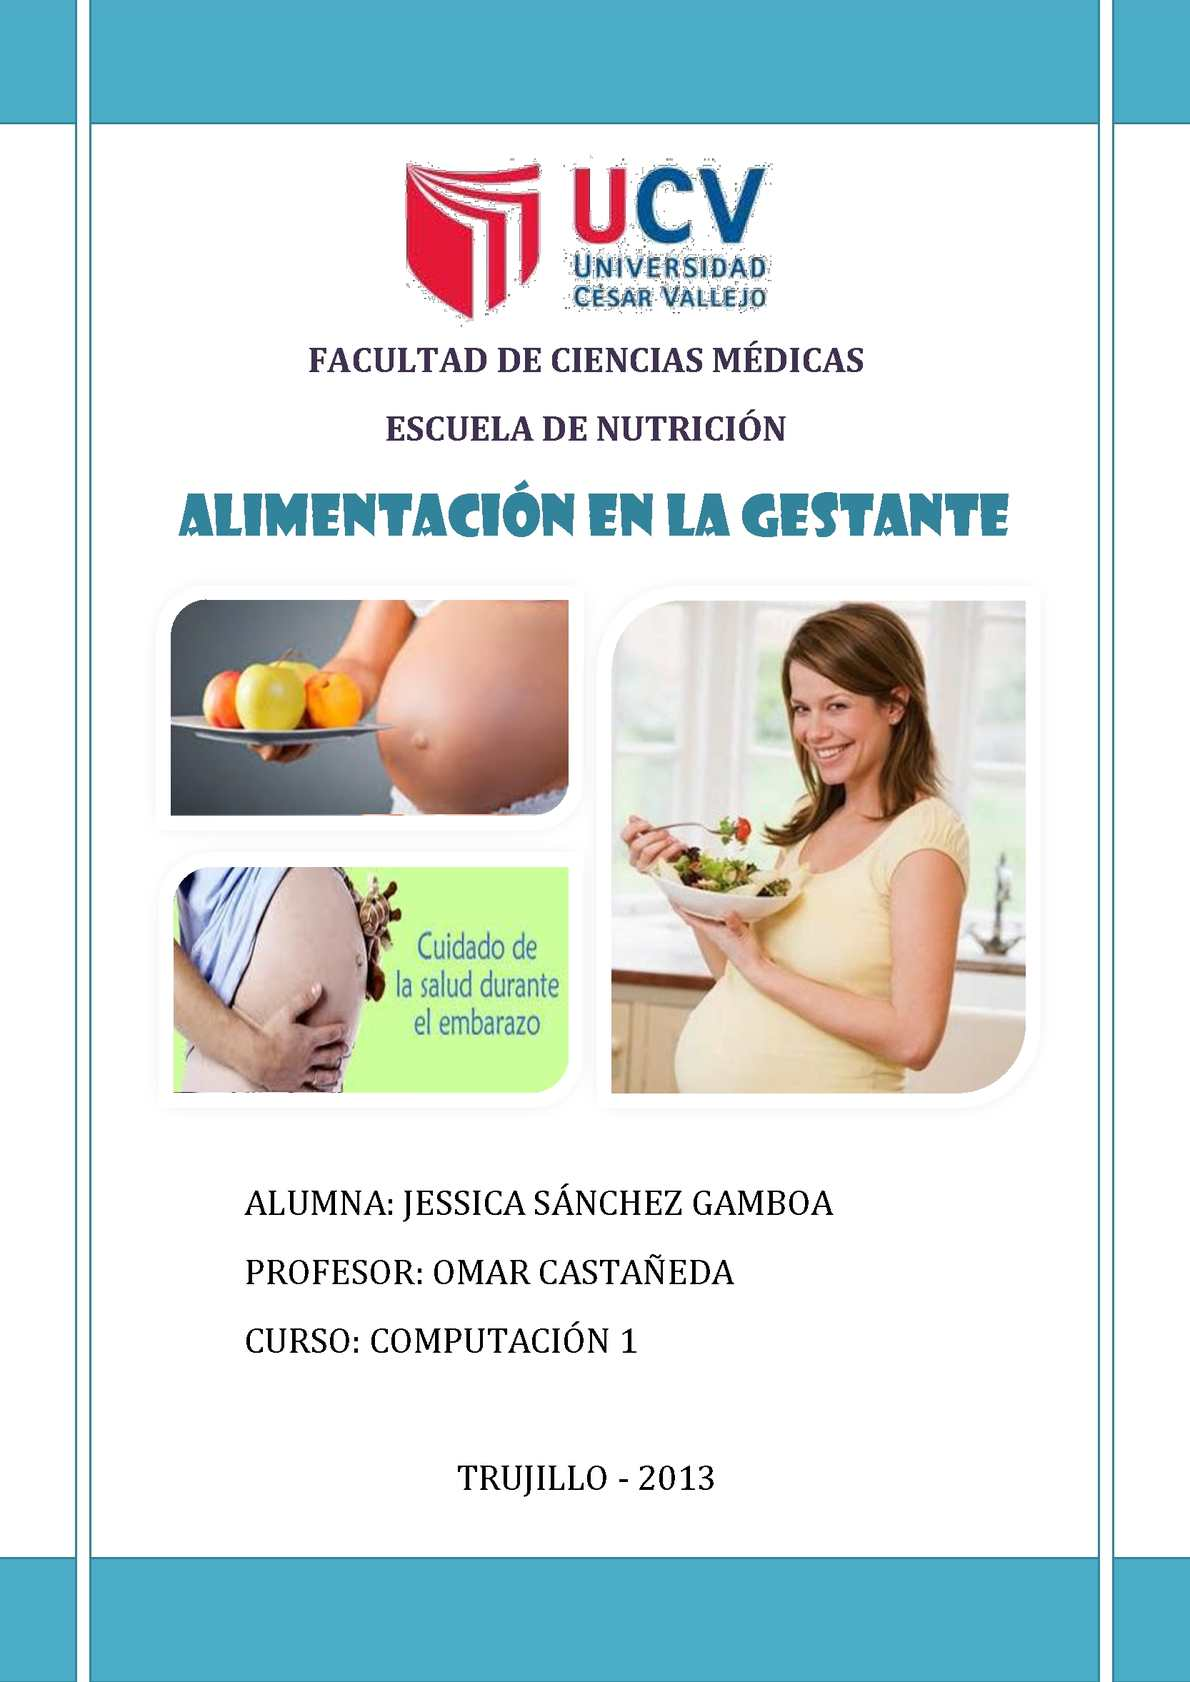 dieta de 1700 calorias para embarazadas con diabetes gestacional